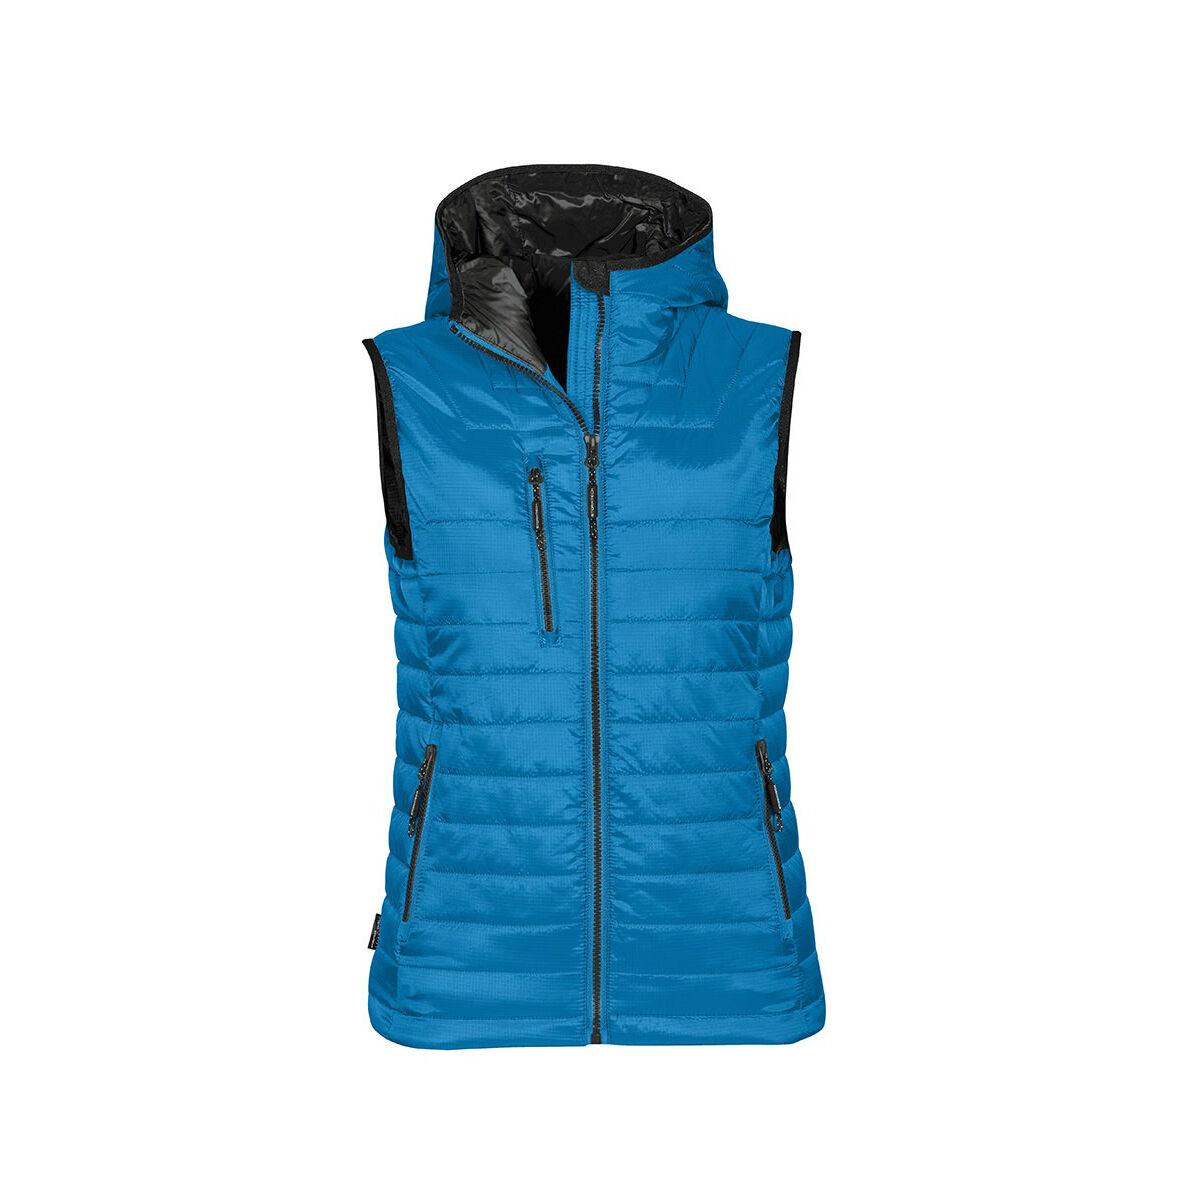 Womens Stormtech Thermal Vest